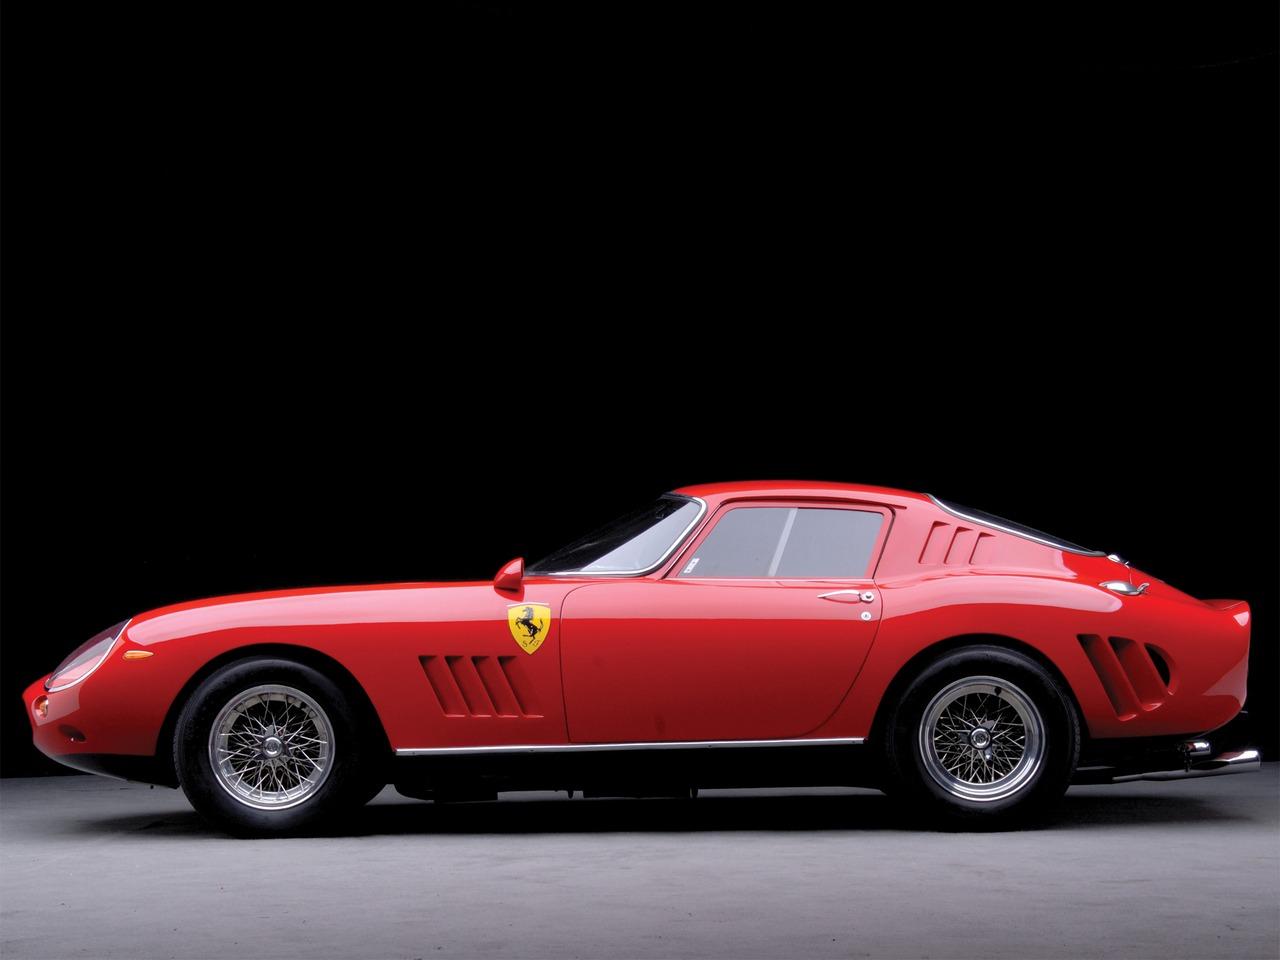 Ruote Rugginose Ferrari 275 Gtb Competizione 1965